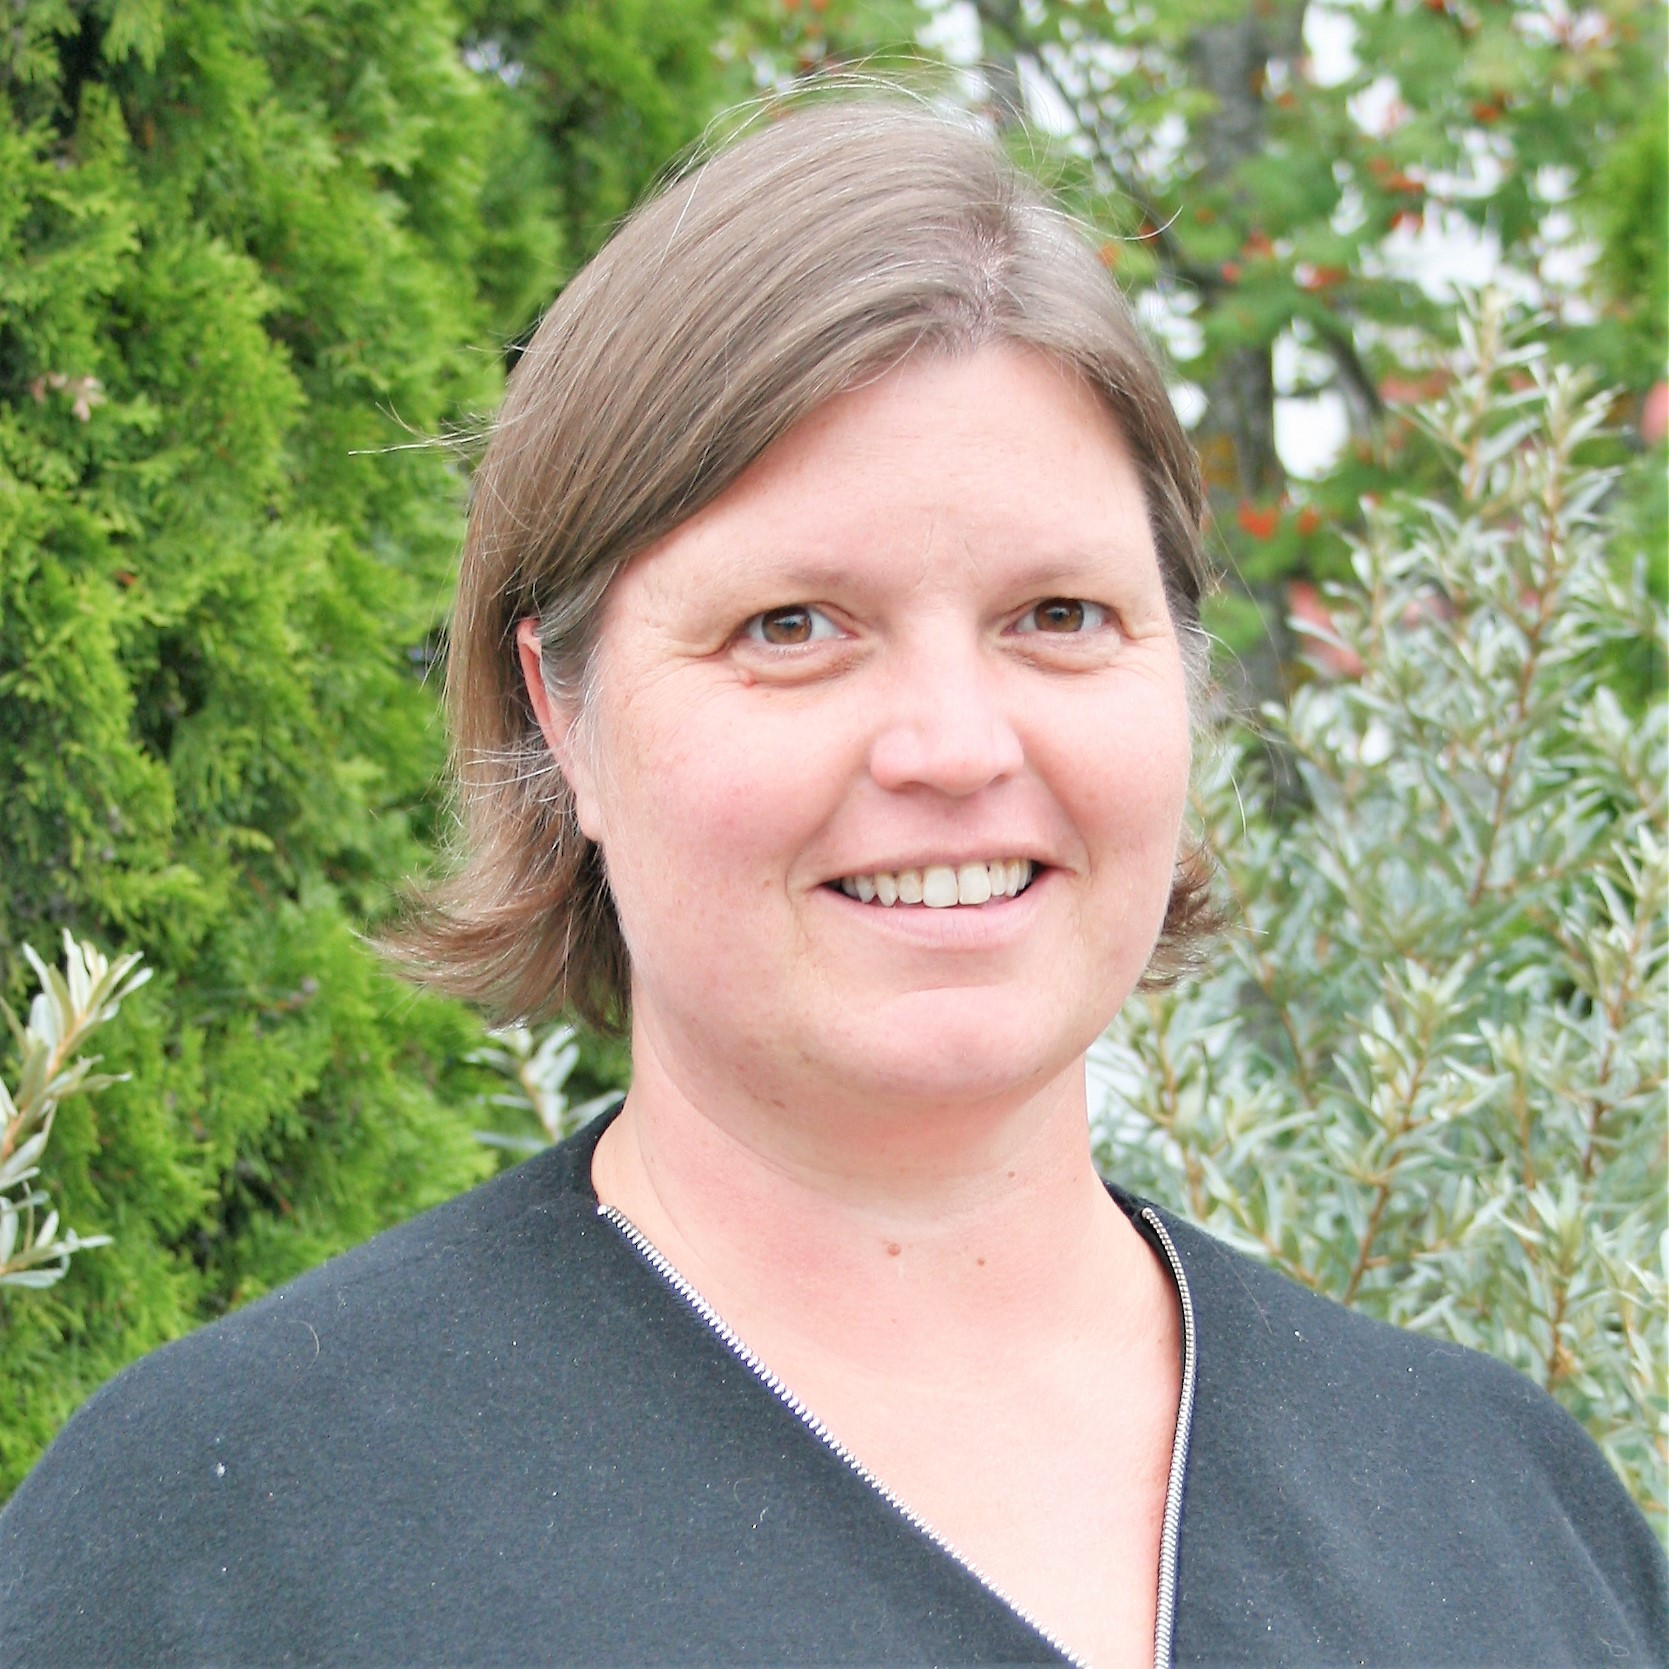 Liv Thea Hanestad : Ingeniør